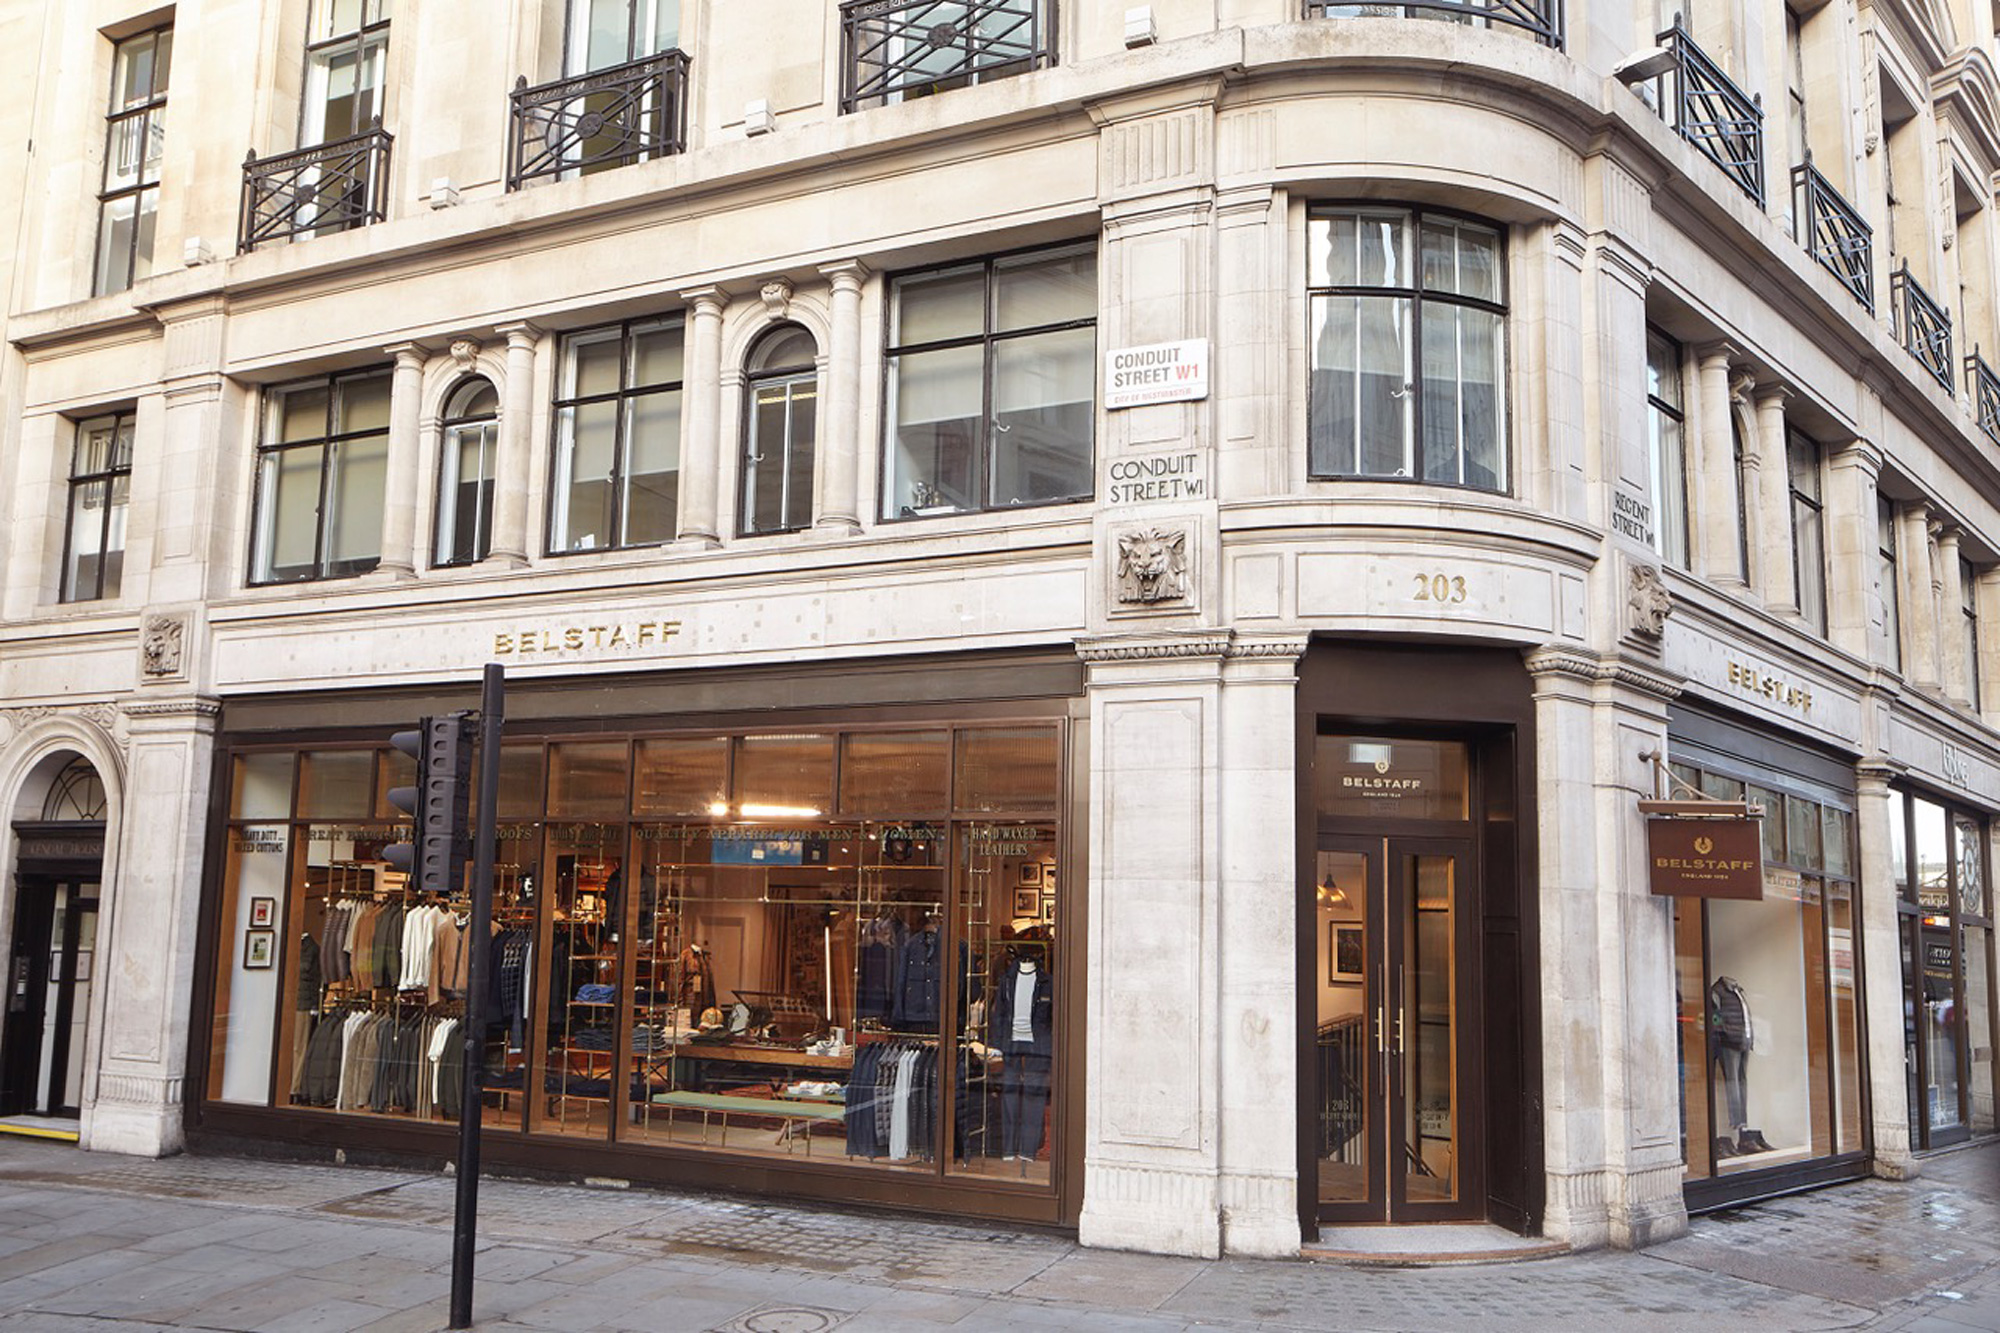 Belstaff exterior shop front